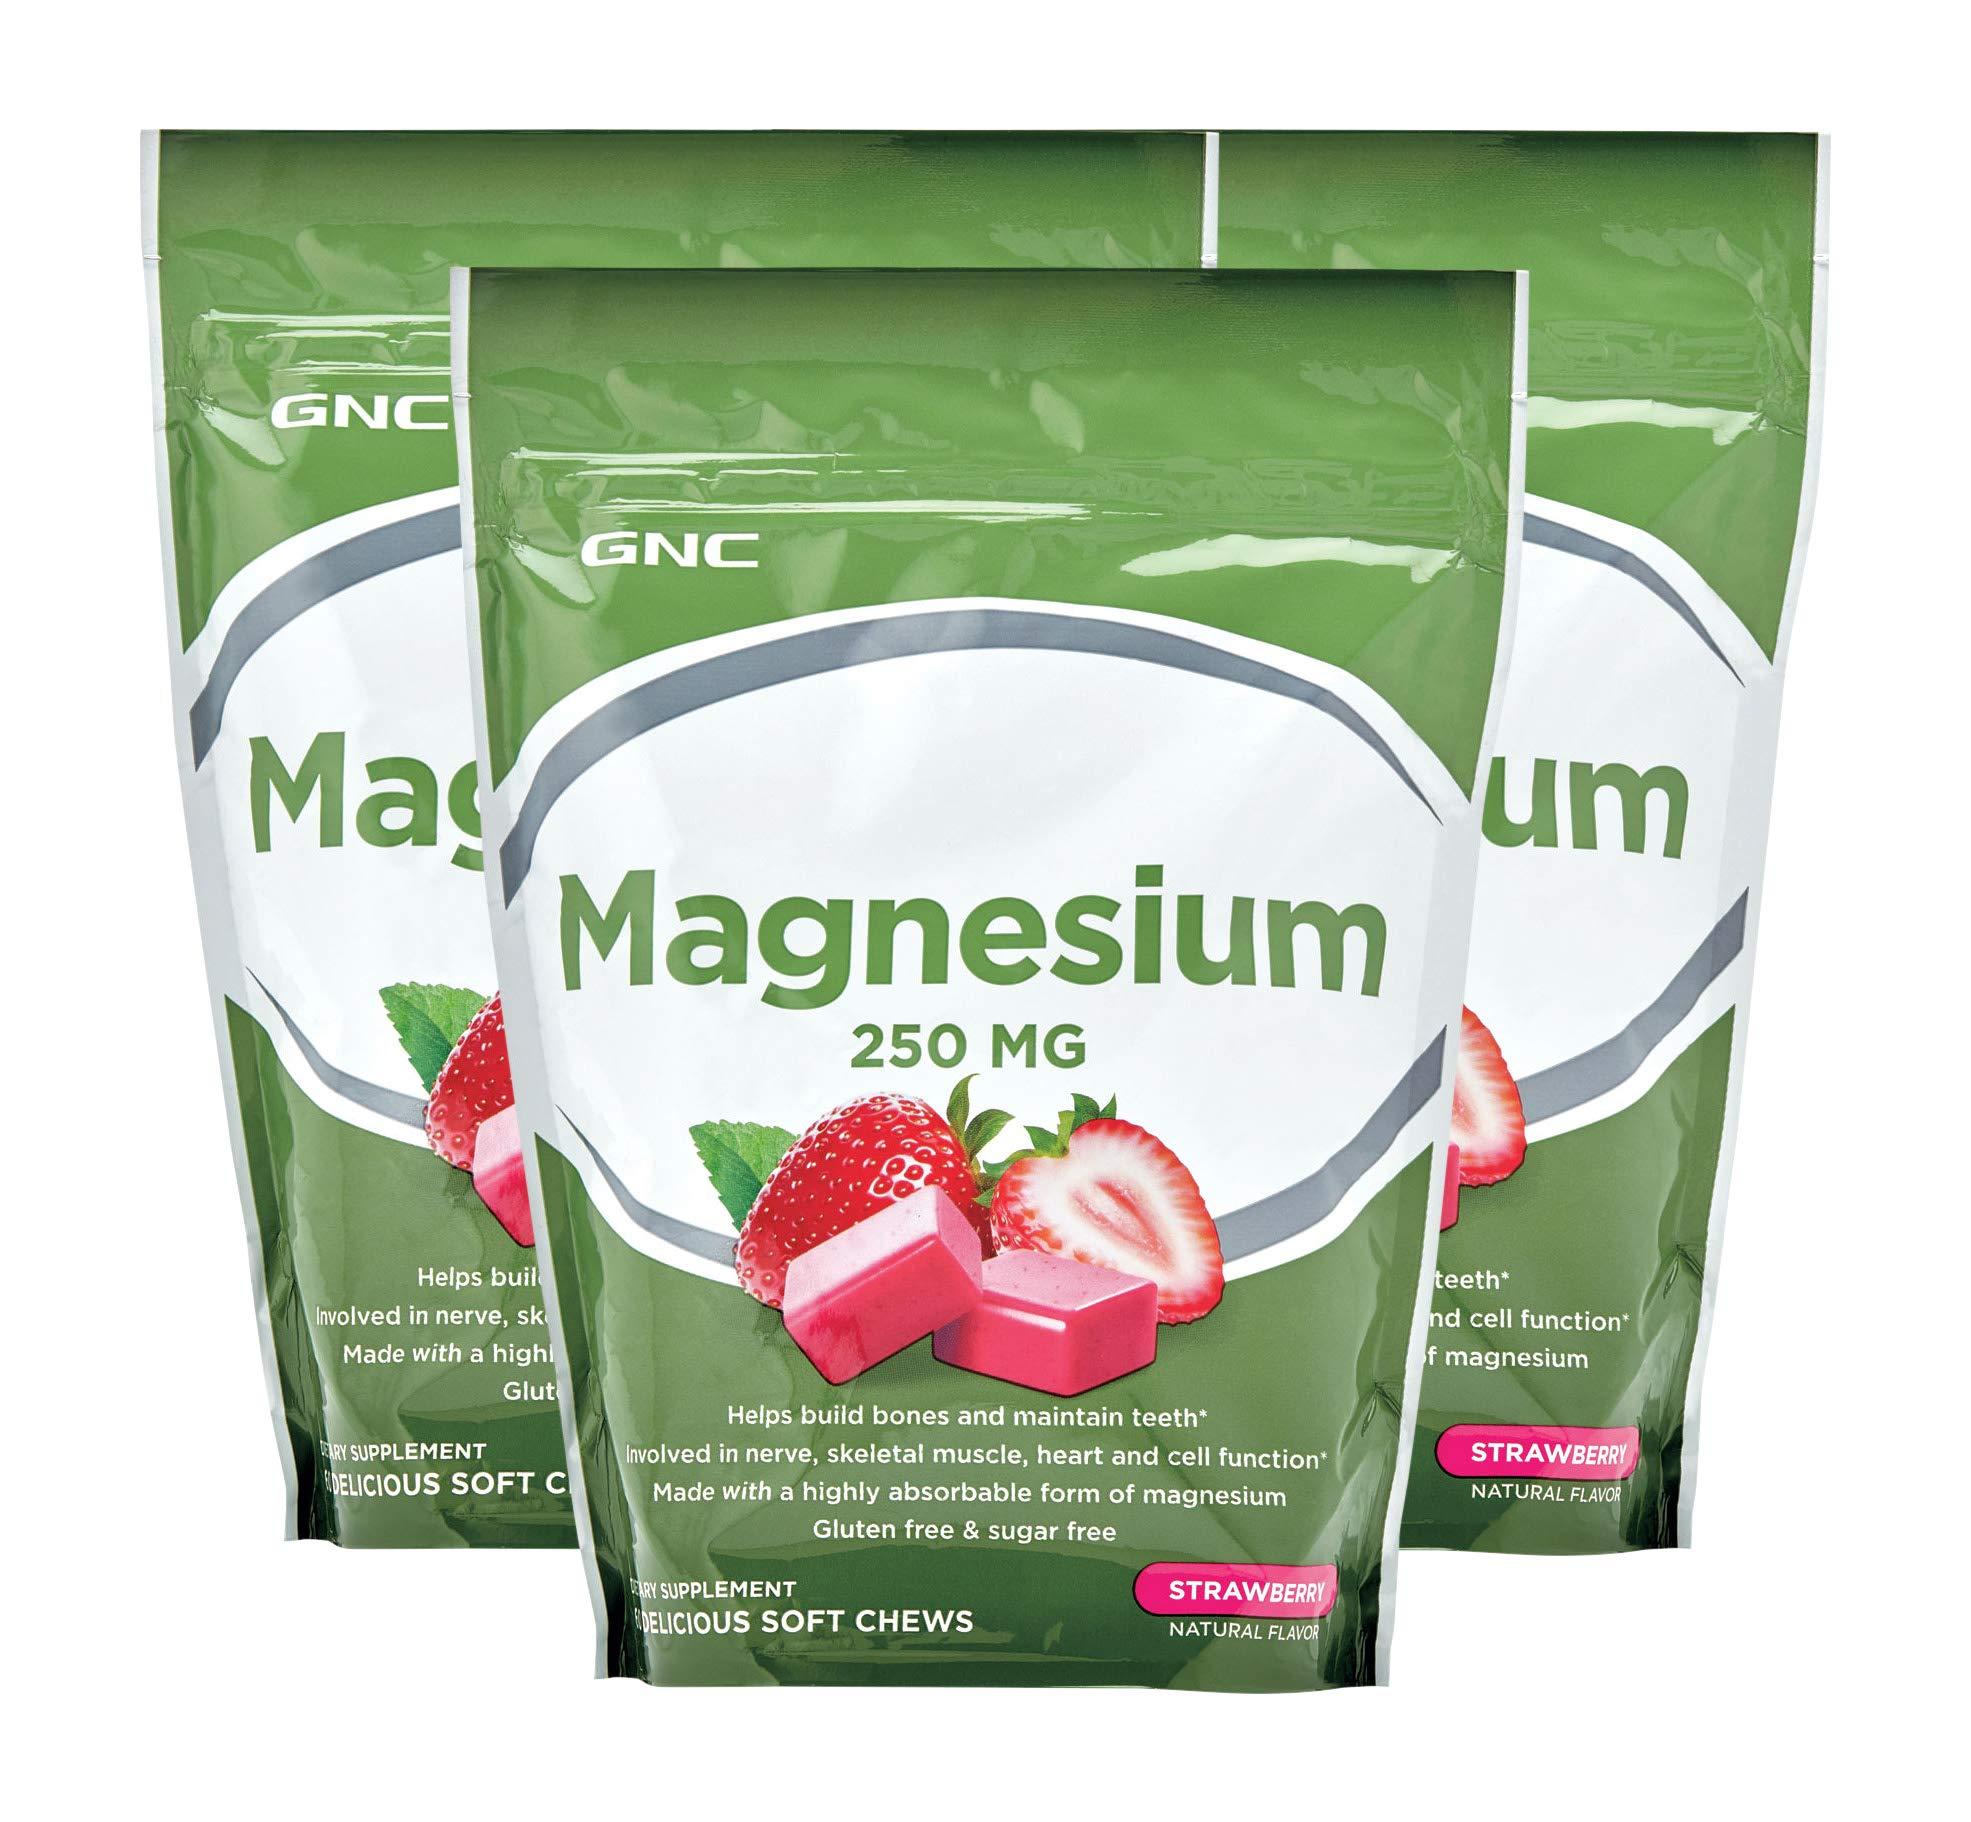 GNC Magnesium 250mg - Strawberry - 3 Pack